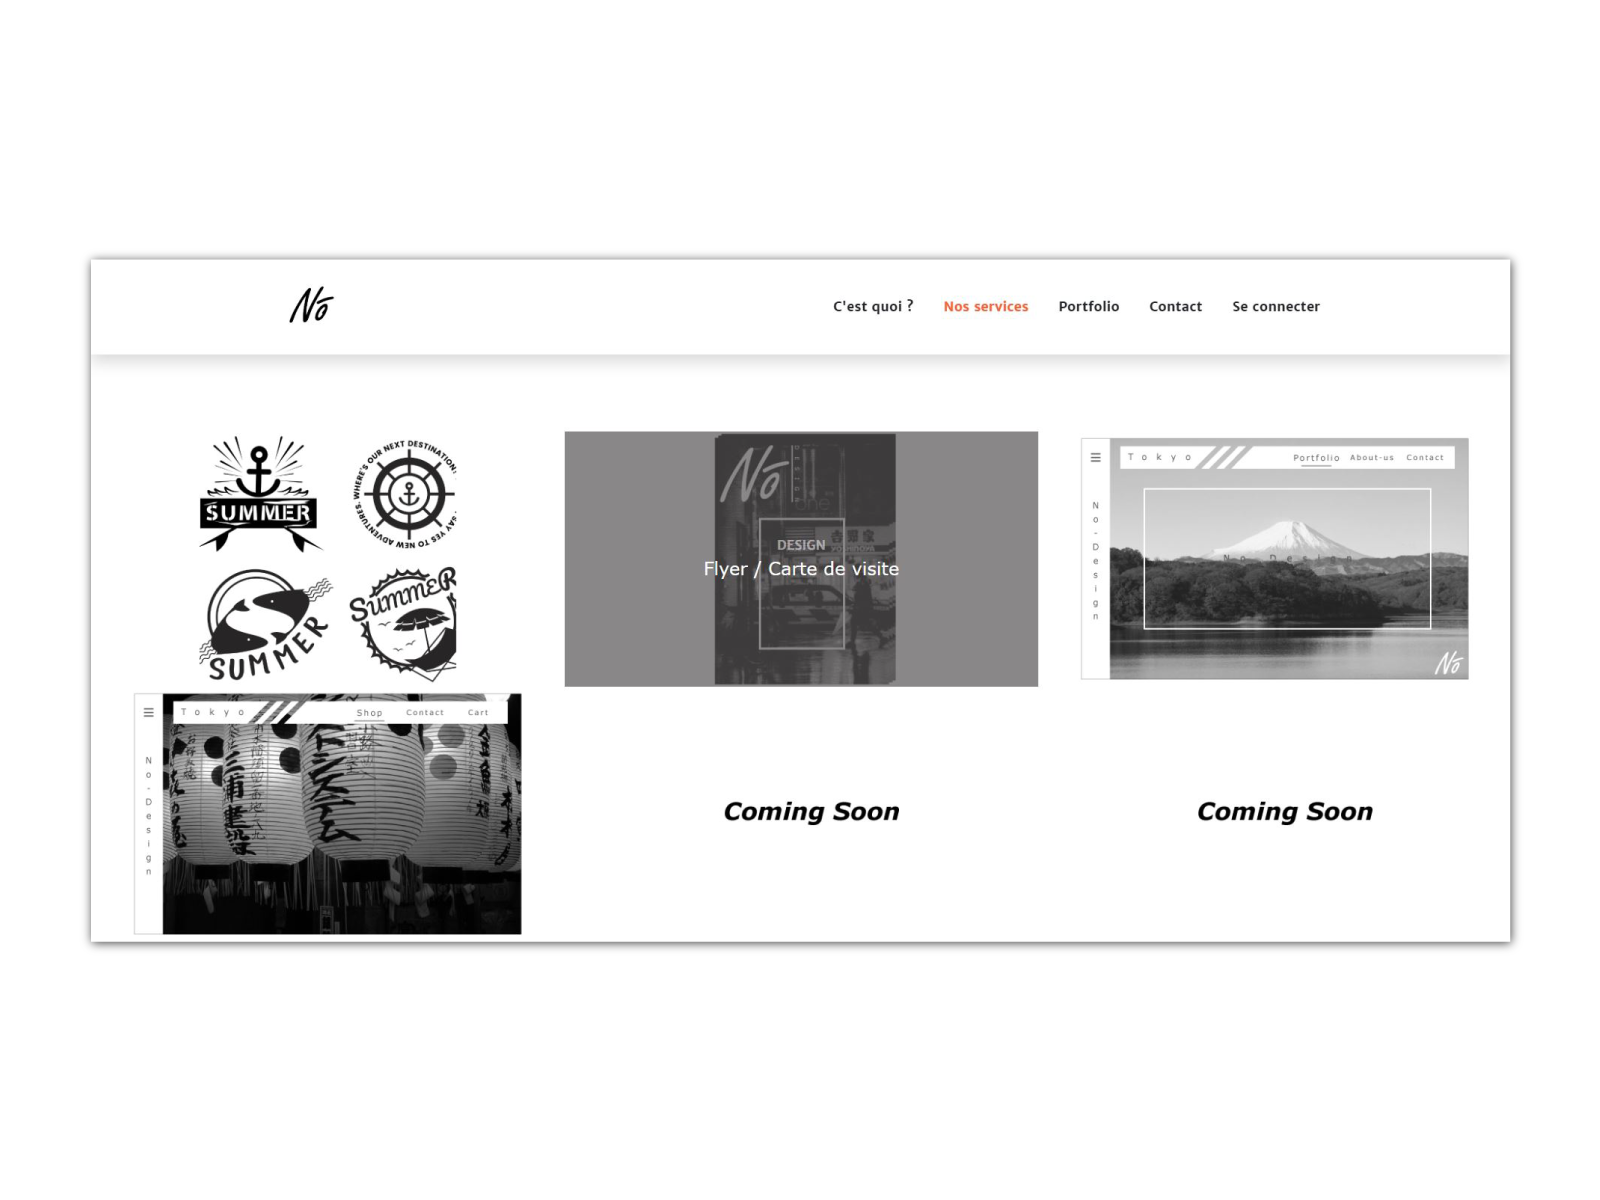 Web Design Nodesign By Florian Bique On Dribbble